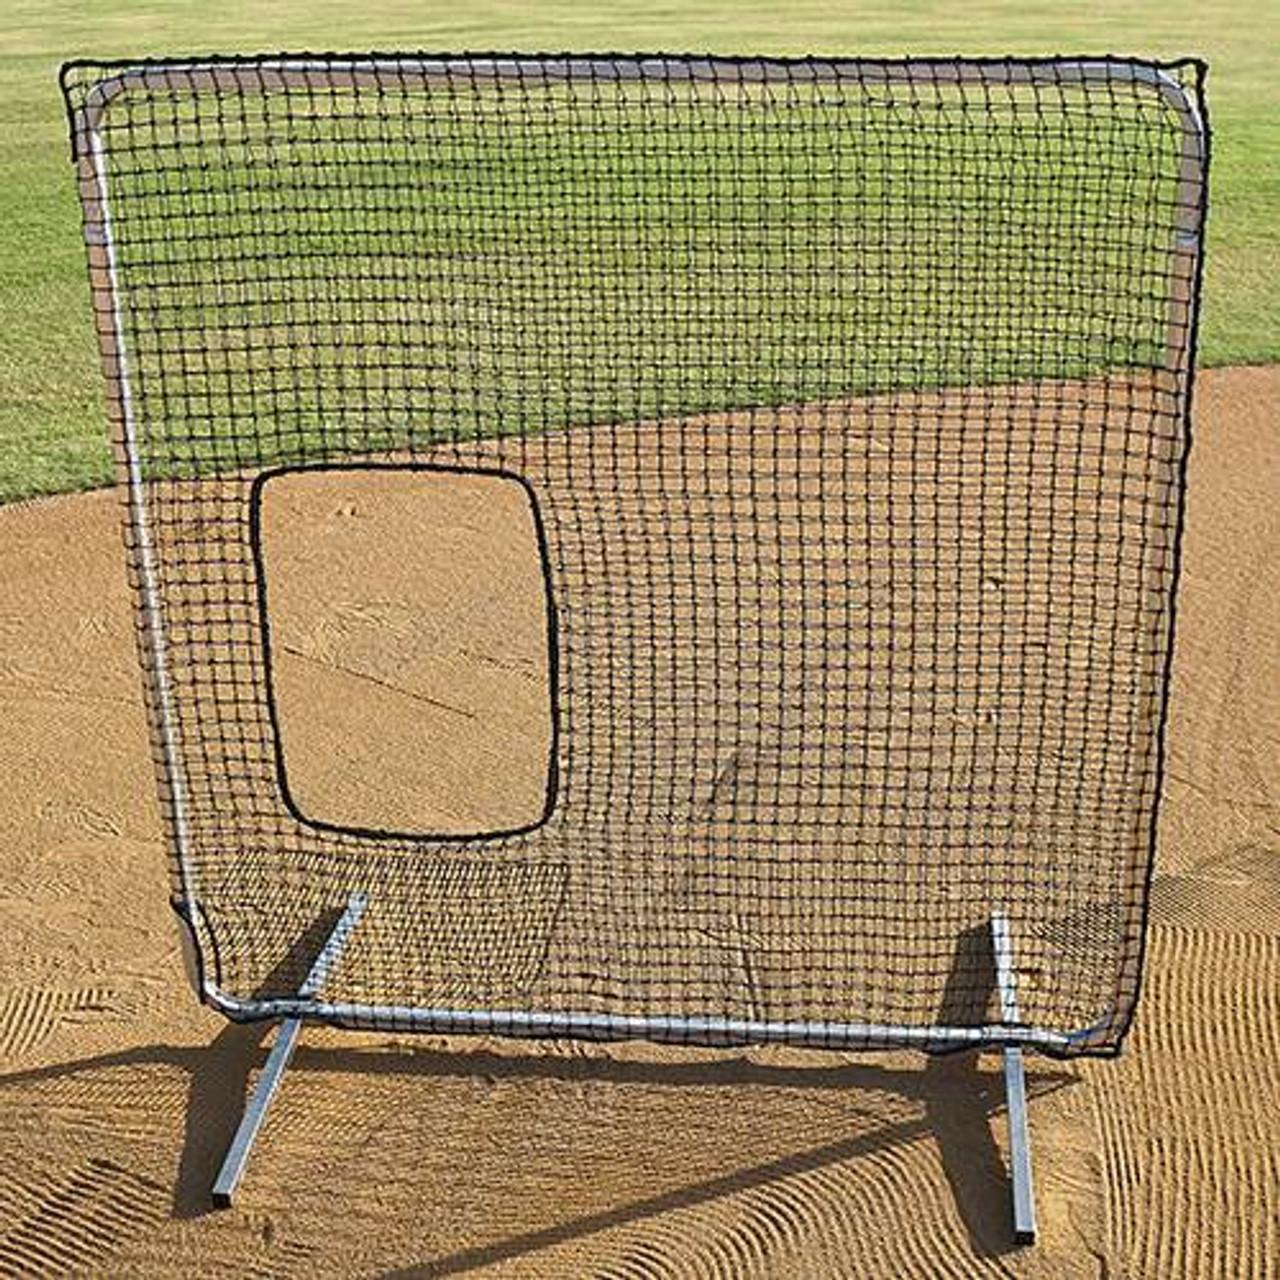 Replacement 7' x 7' Slip-On Net-Softball